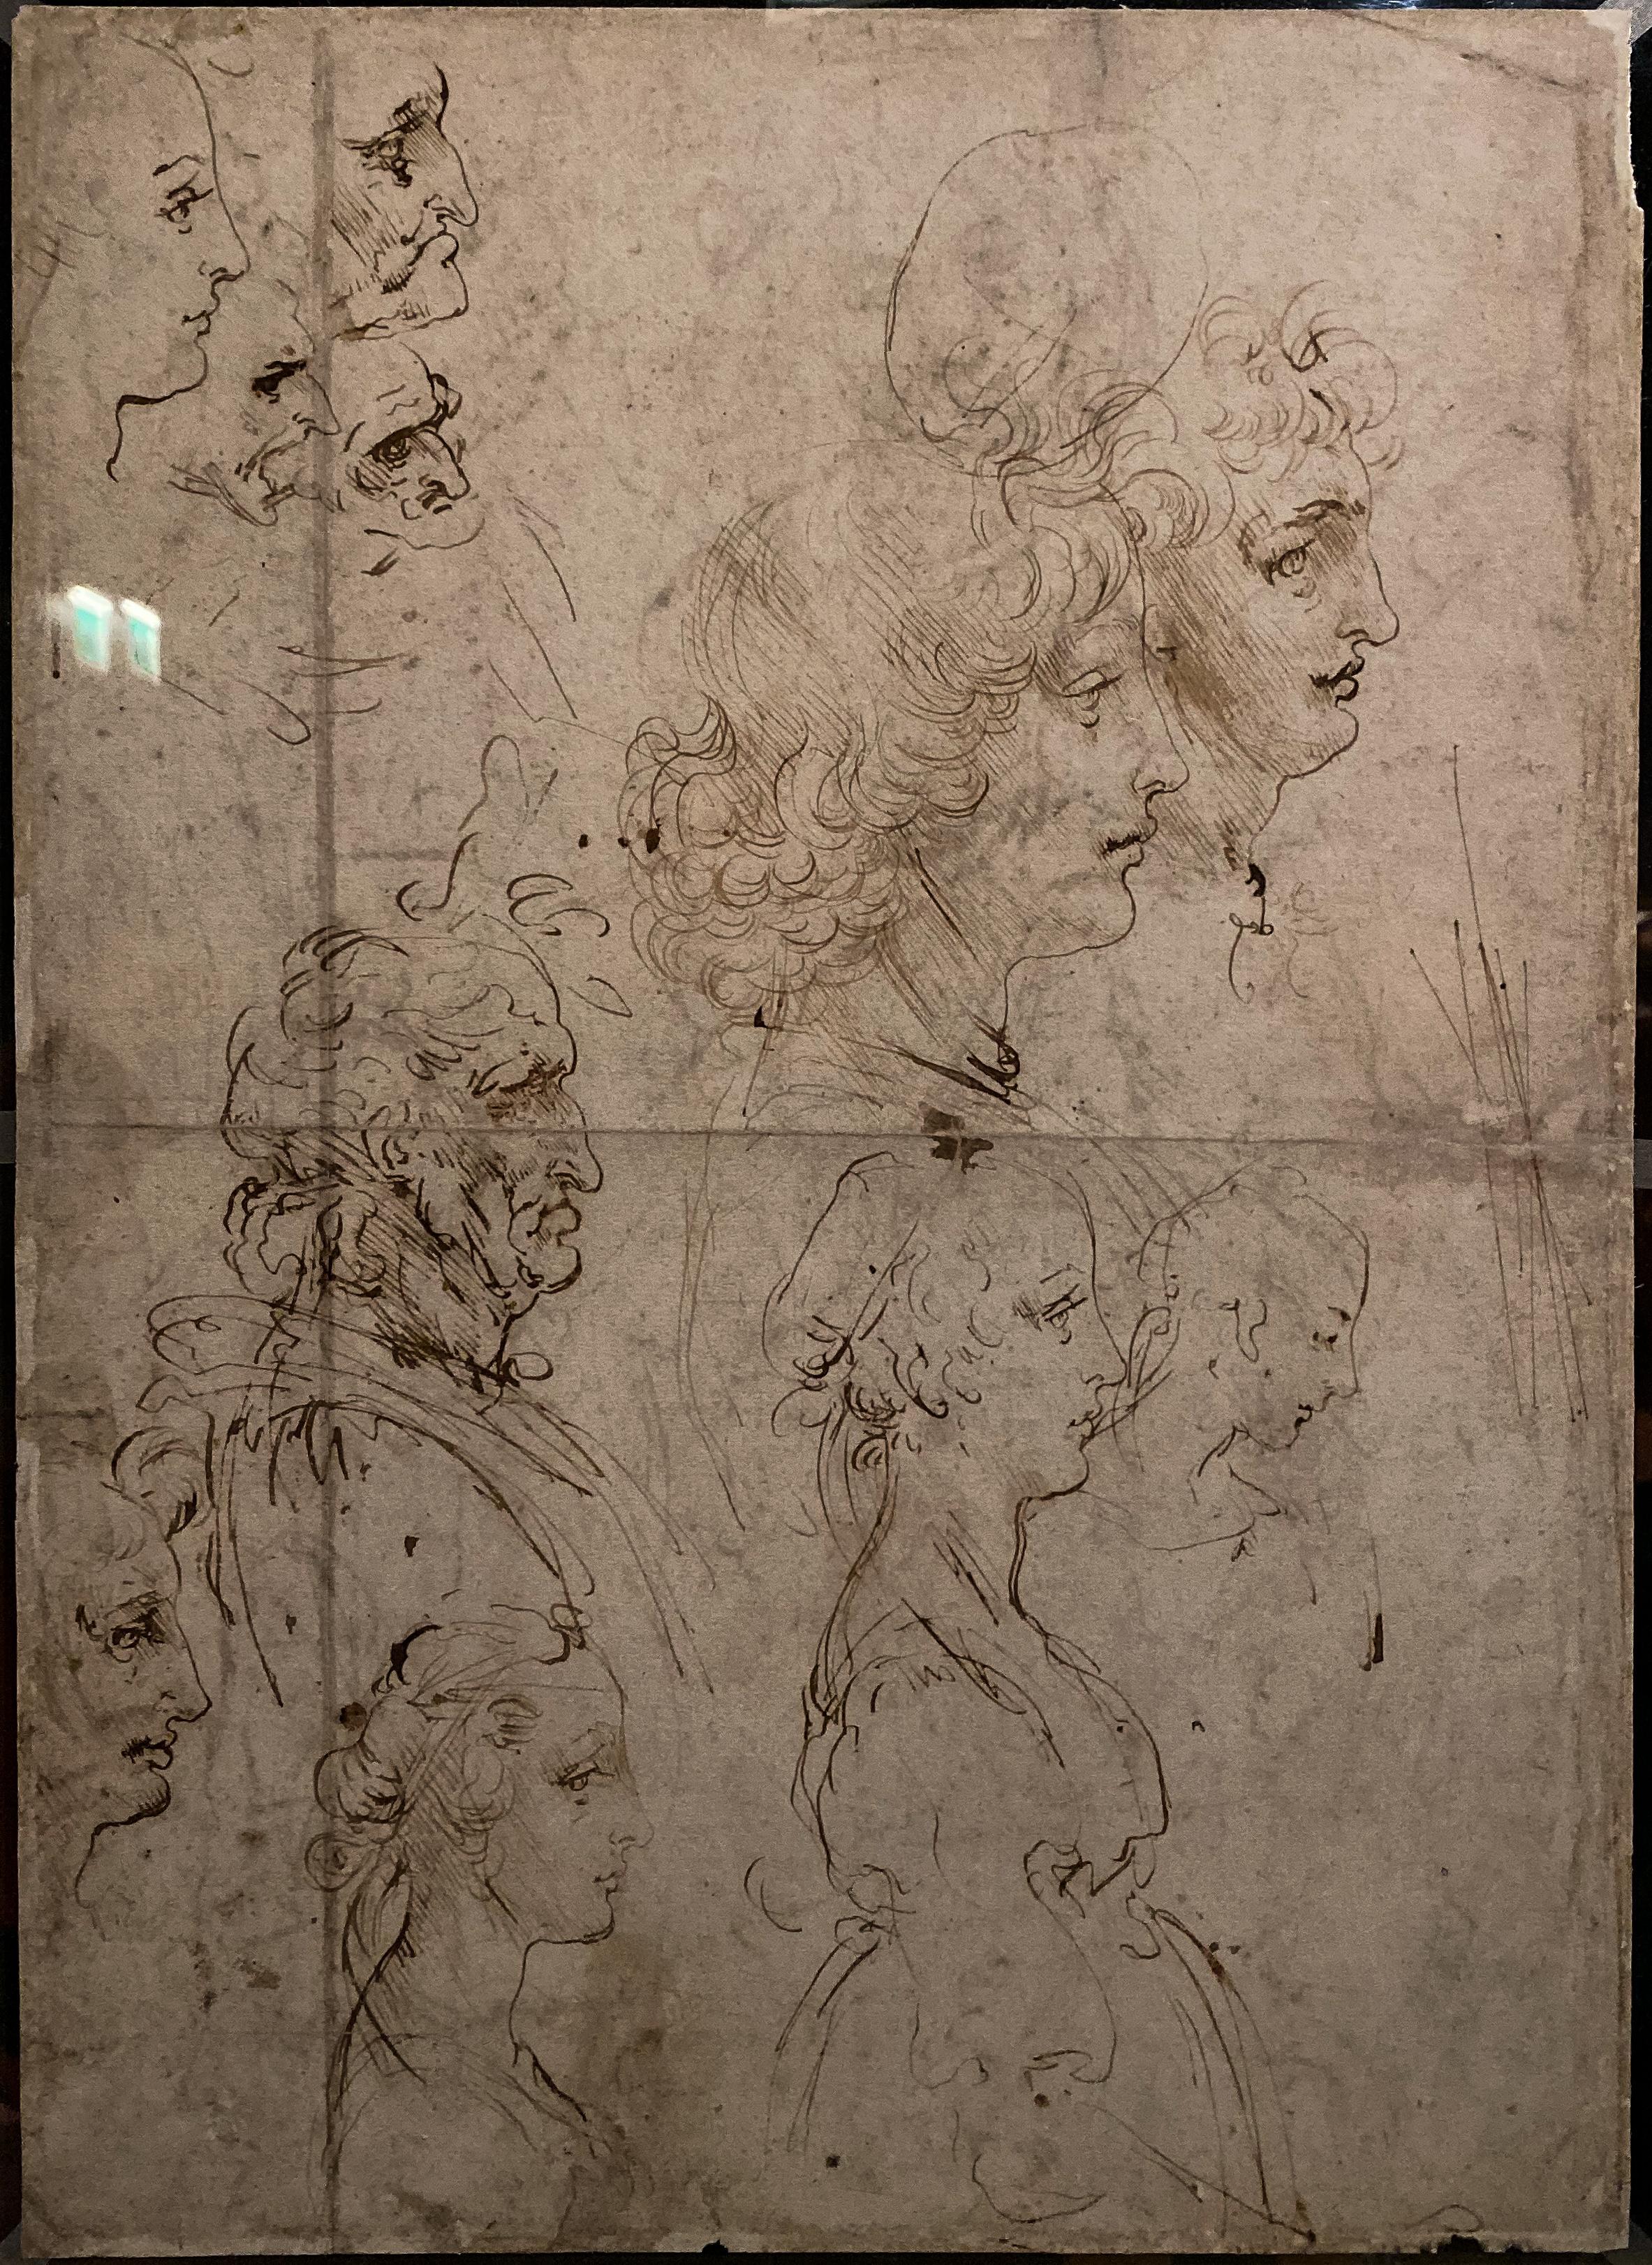 Leonardo da Vinci – Jahrhundertausstellung im Louvre Studienblatt Windsor Rückseite